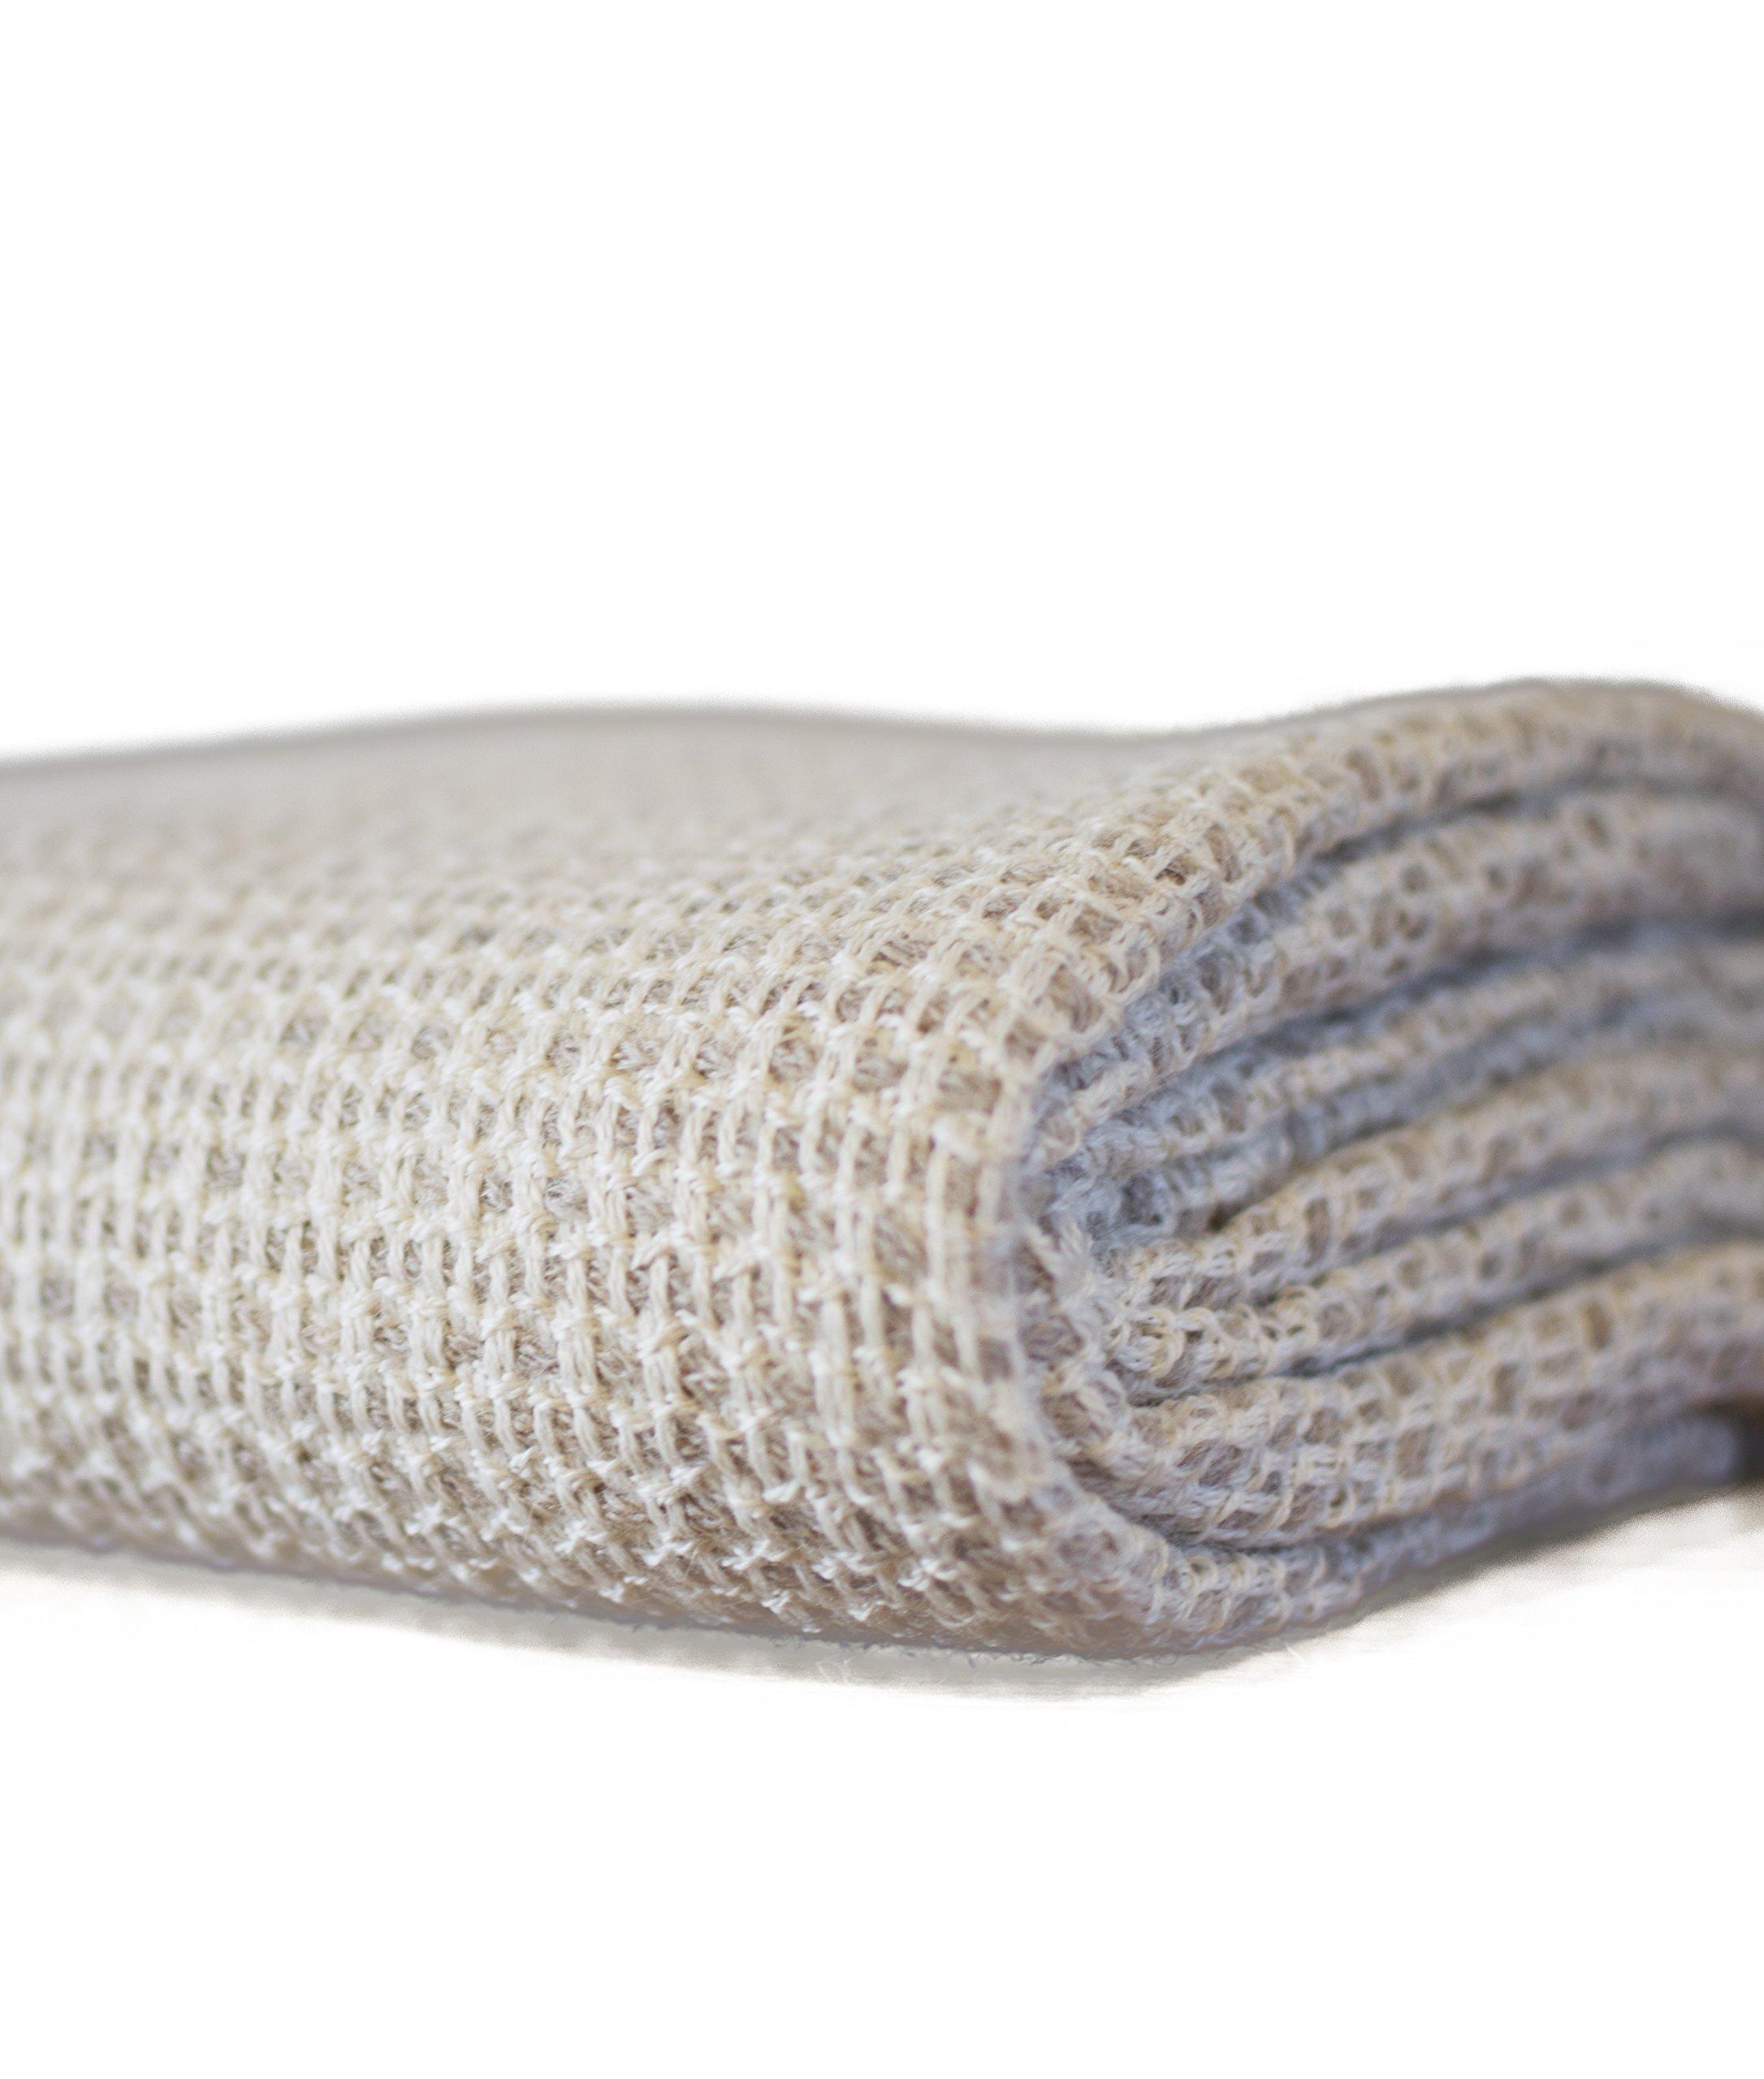 Premium Super Soft Alpaca Wool Hand Woven Throw Blanket (Taupe)